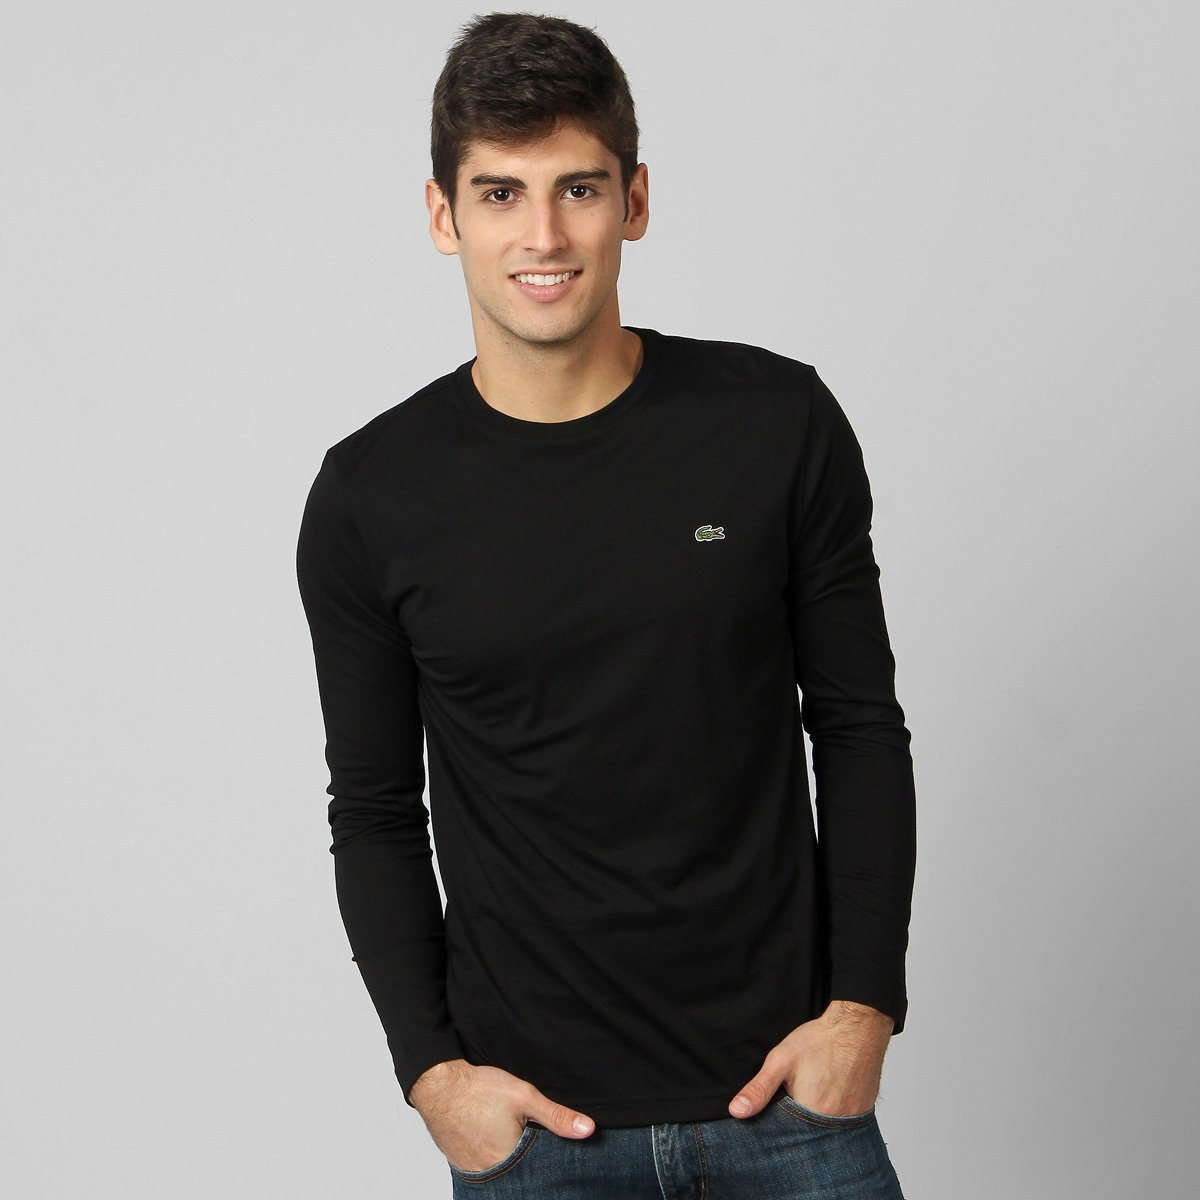 Camiseta Lacoste Jersey Manga Longa Masculina - Compre Agora   Zattini c60173d6ad